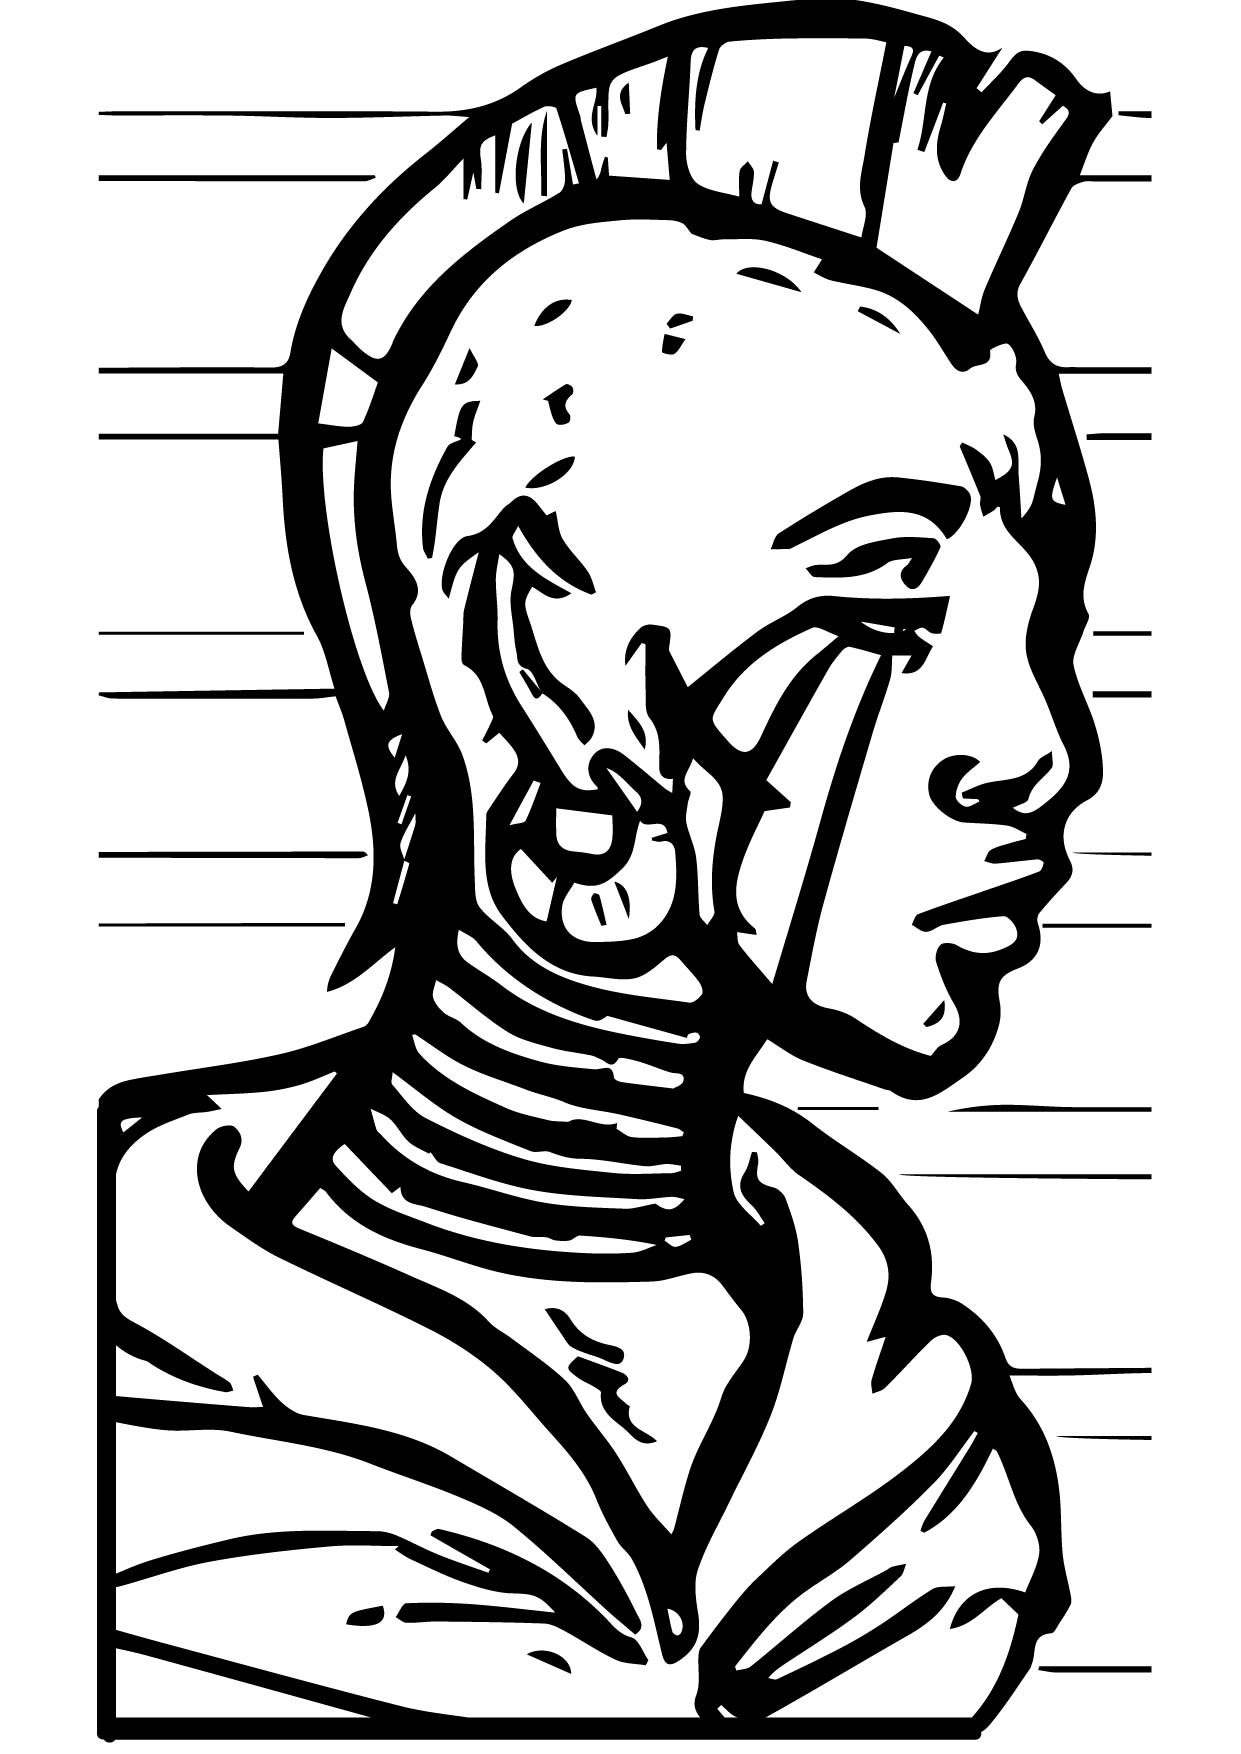 Human Man Zecora Coloring Page